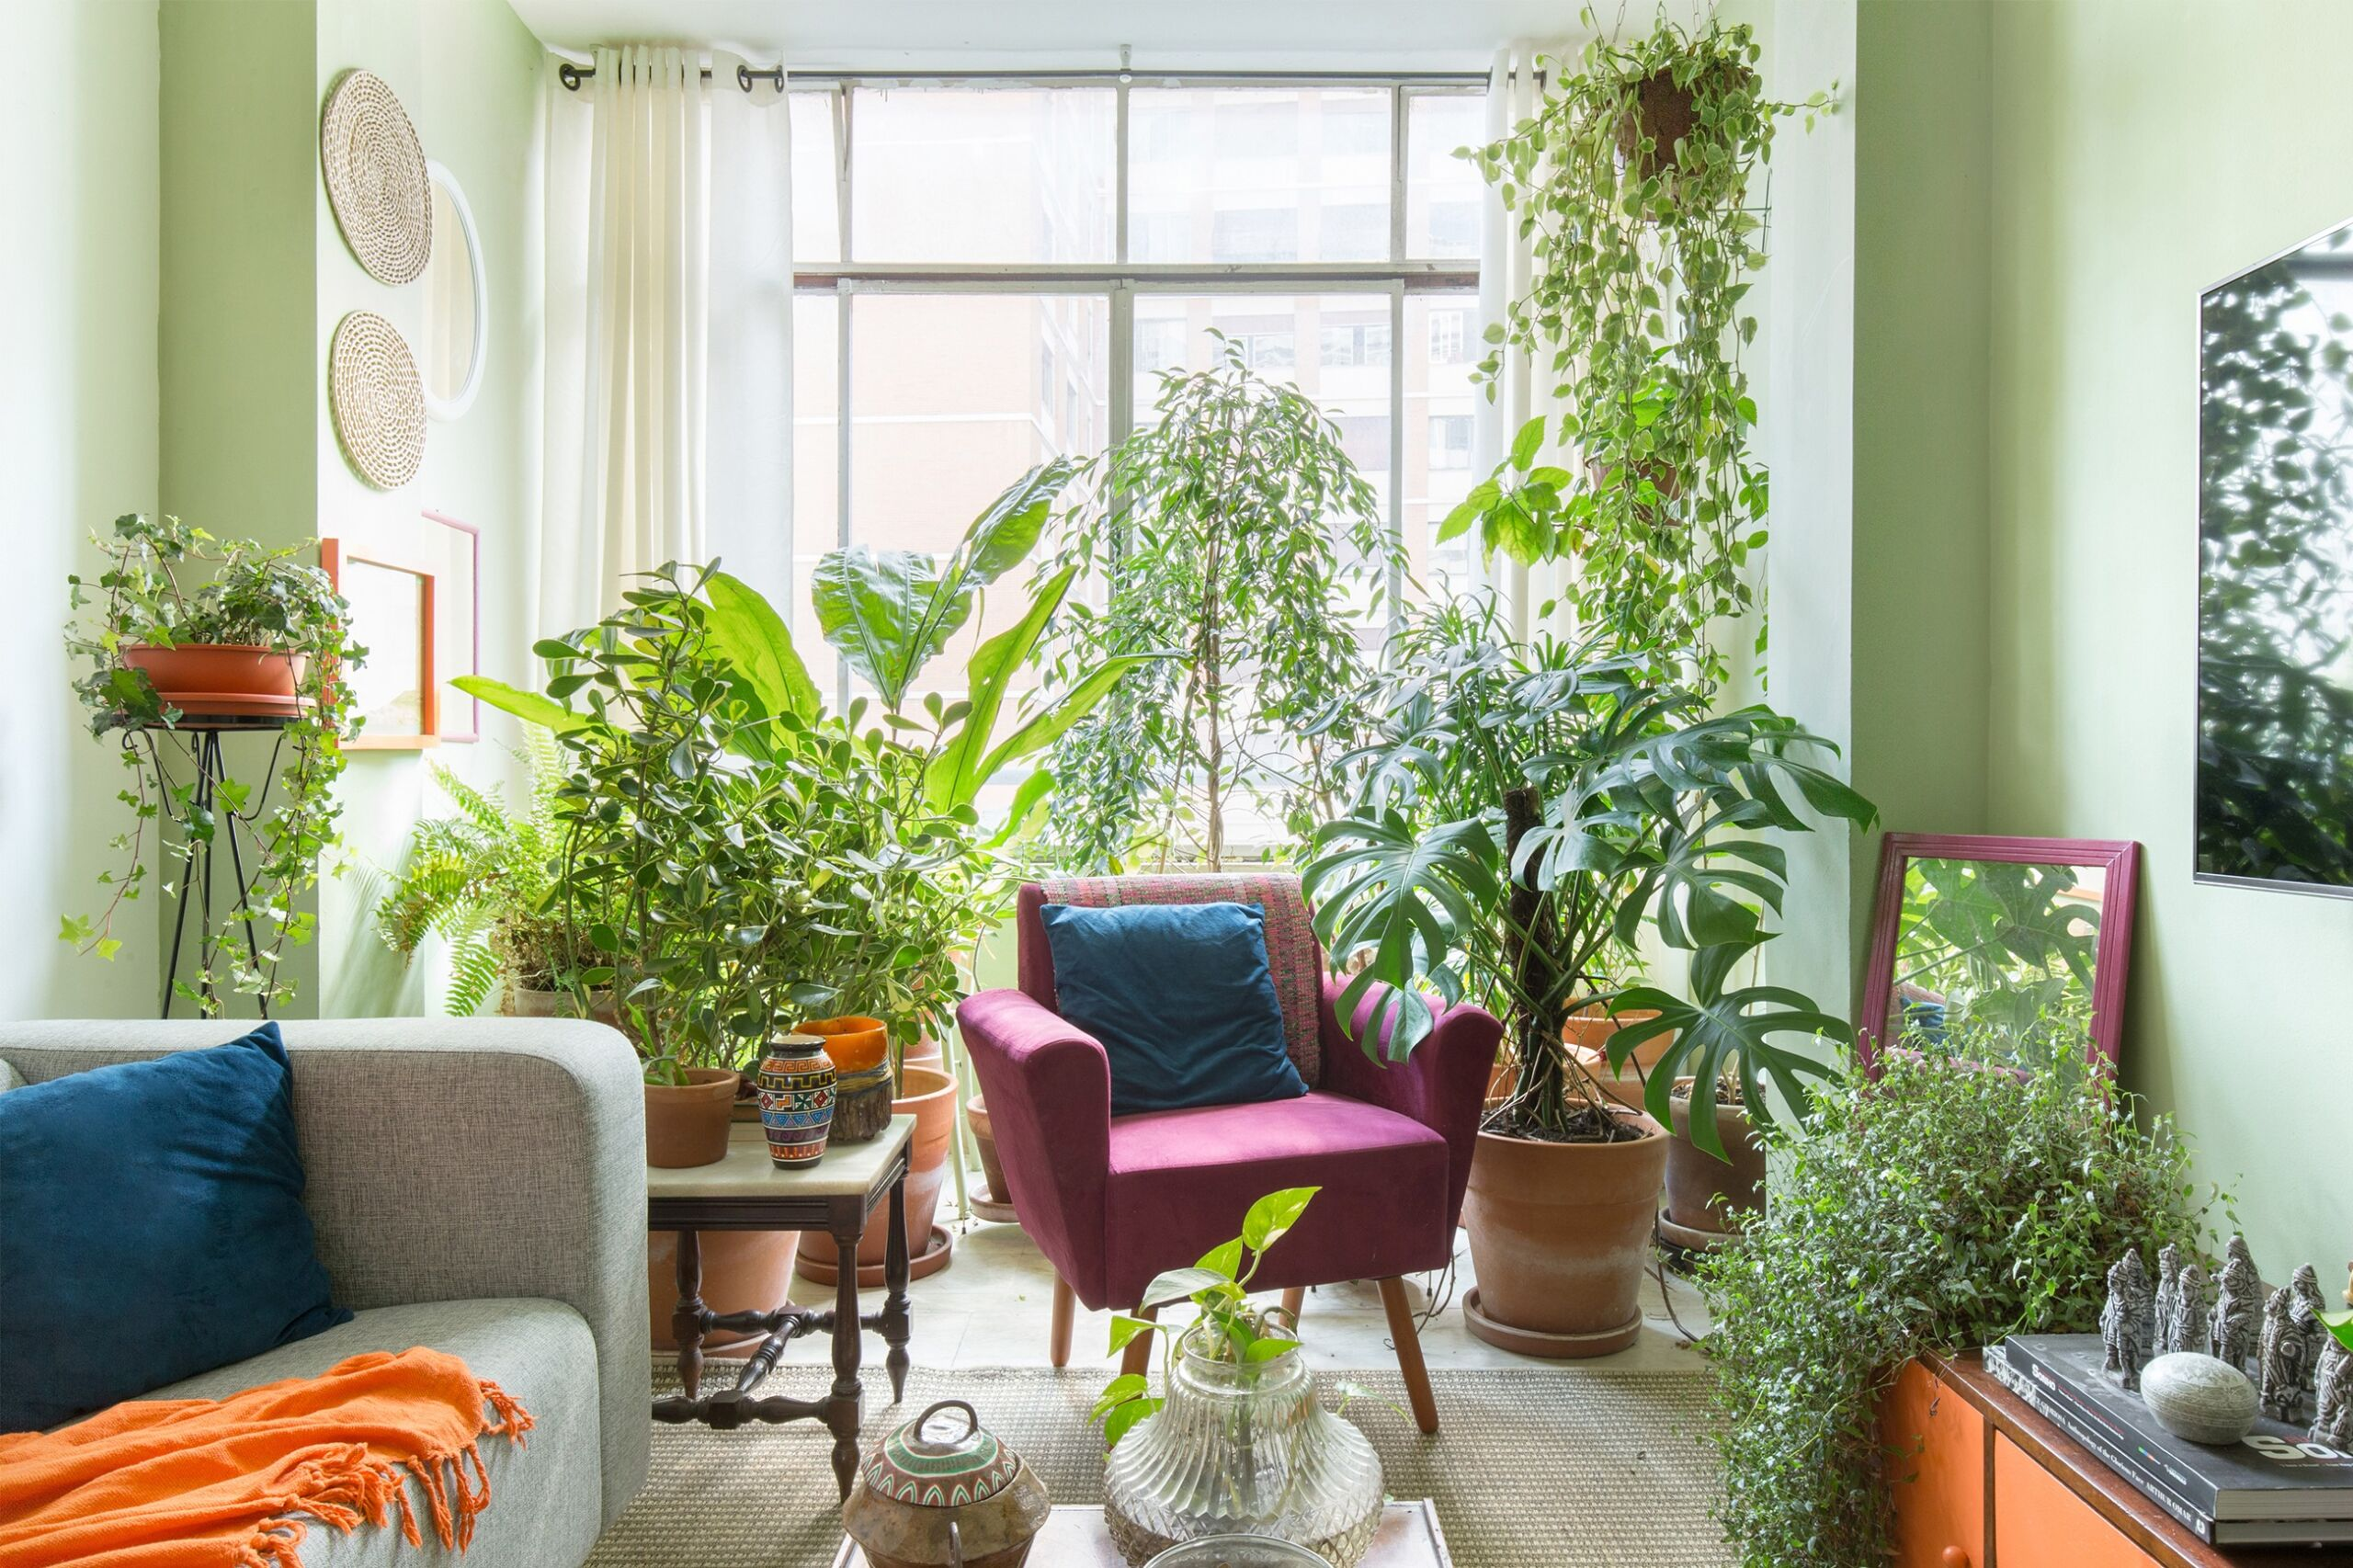 sala-plantas-poltrona-rosa-mesa-madeira